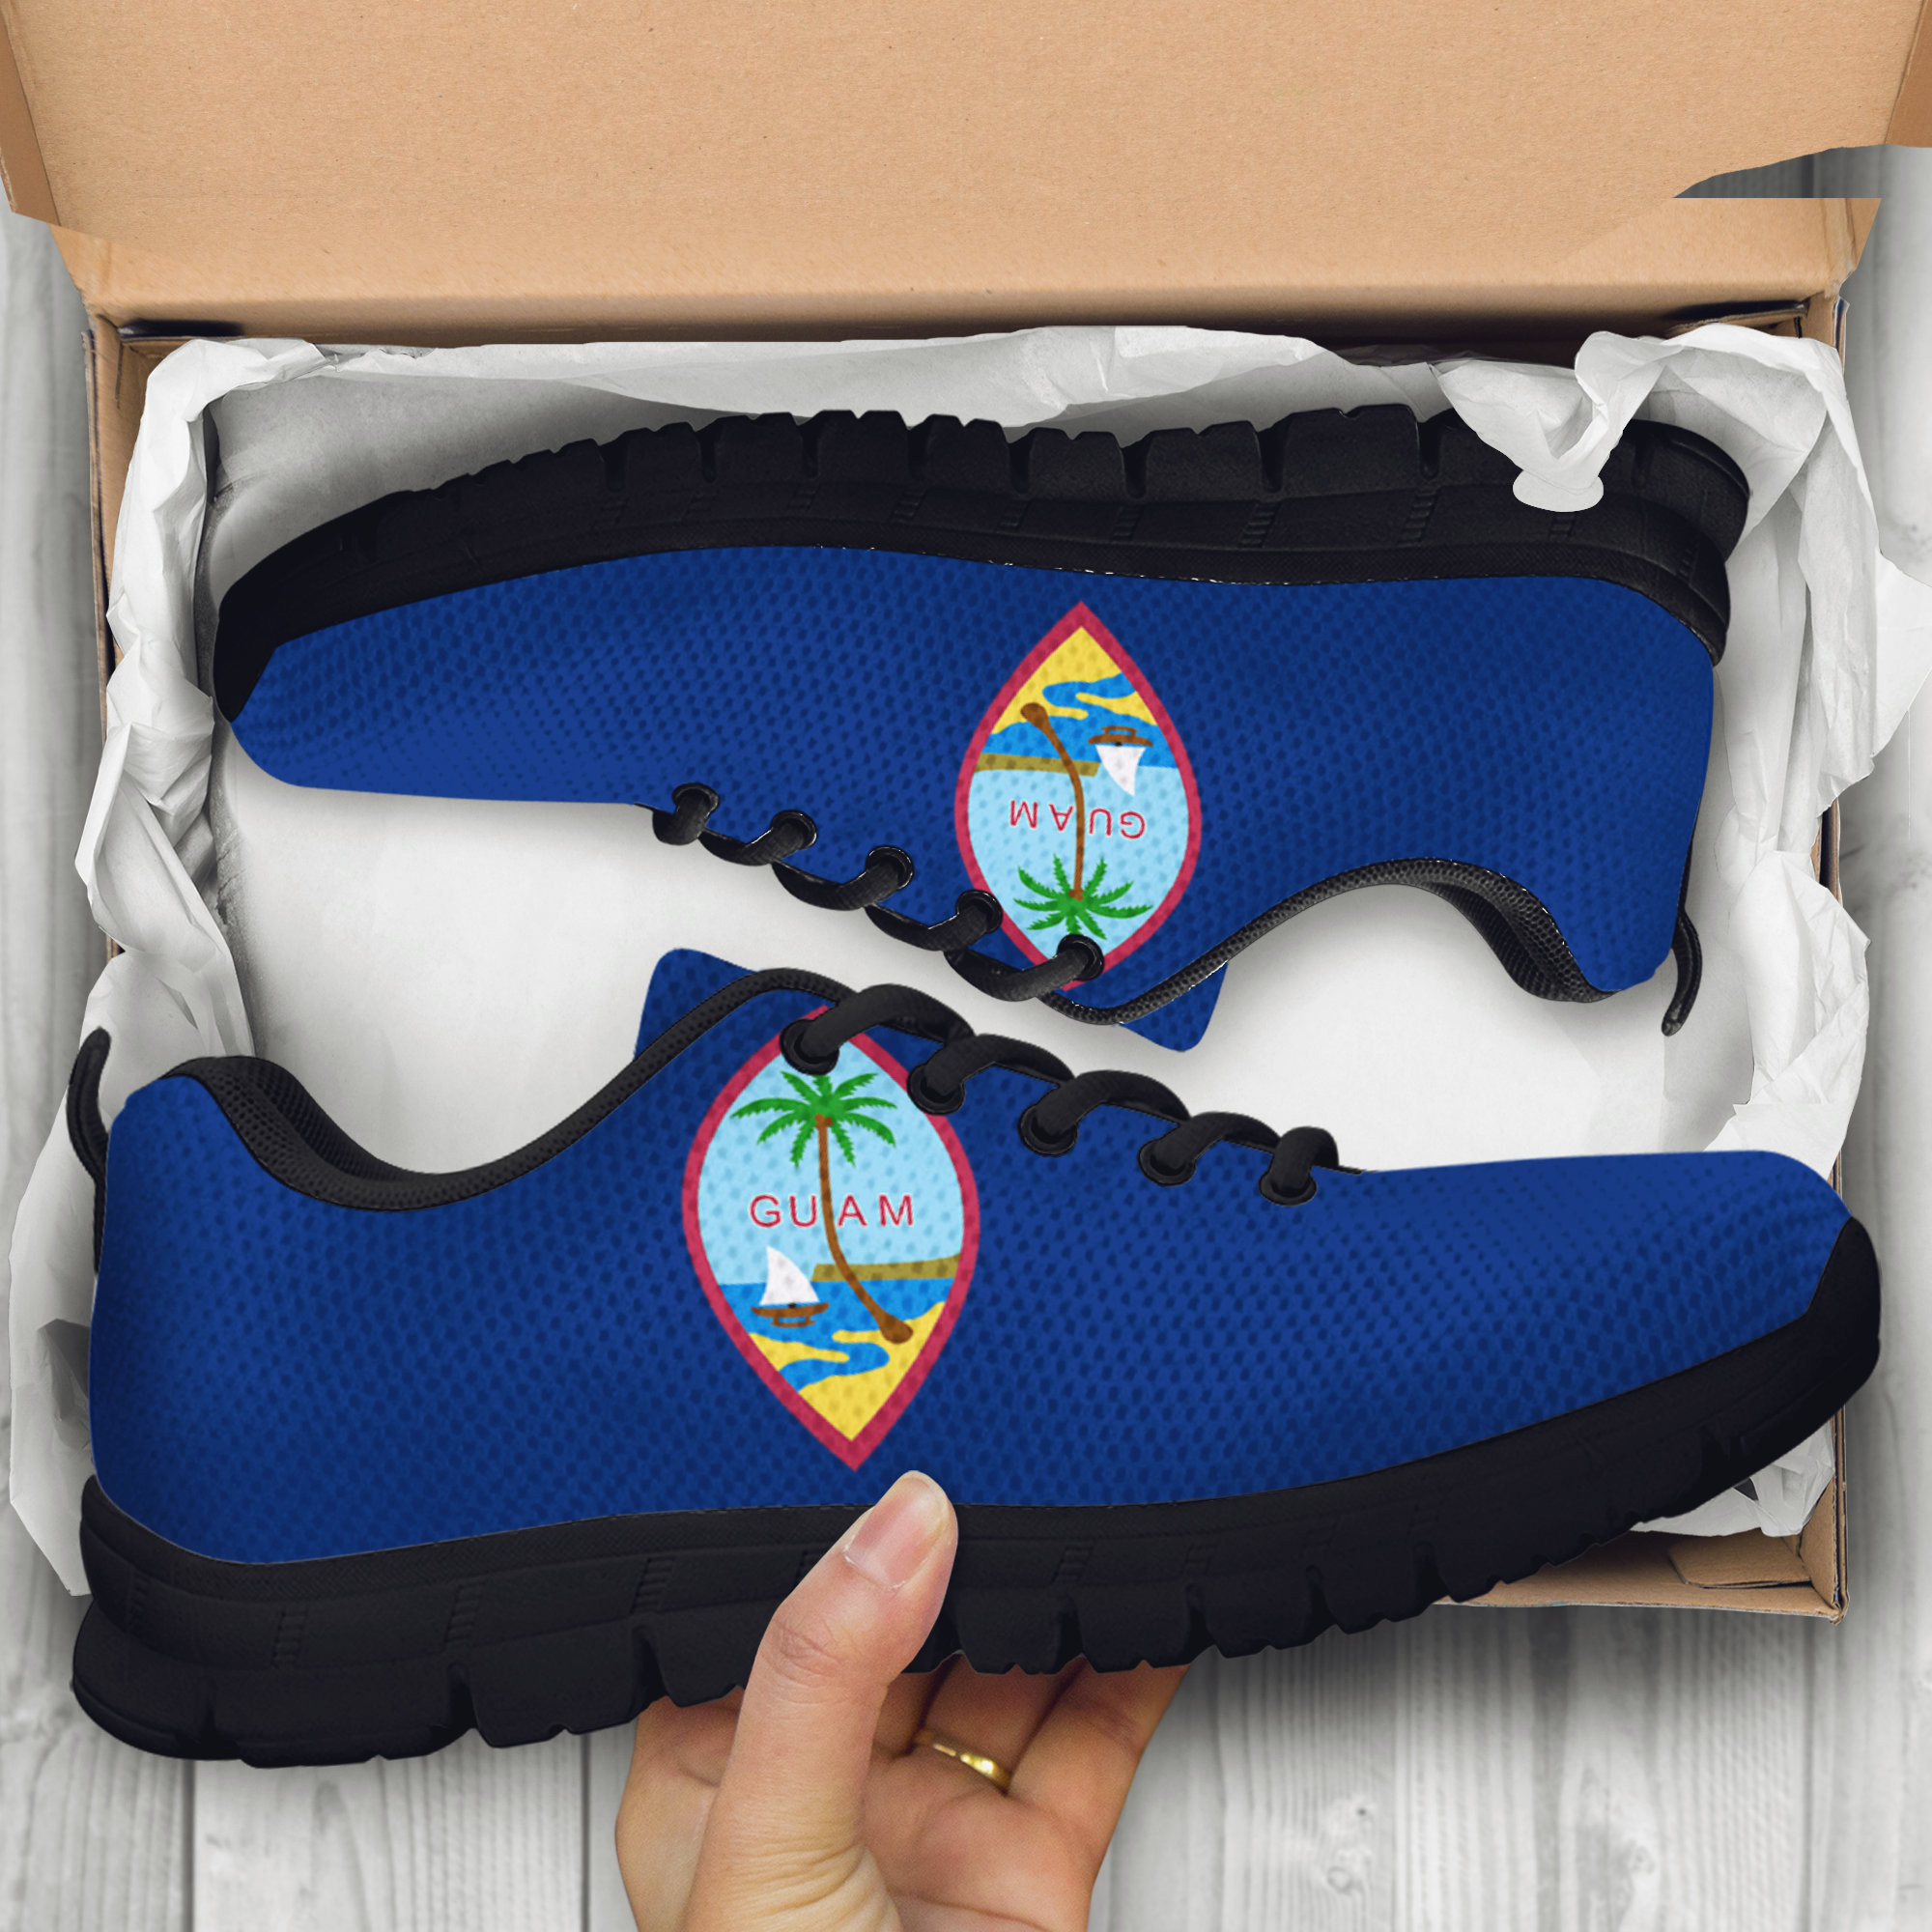 Guam Custom Black Shoes/Sneakers/Trainers - Ladies/Men's/Kids Sizes, Guam Flag, Guam Guam Seal, Guam Designs, Guam Flag, Souvenir, Custom Shoes, Gift 2154d7